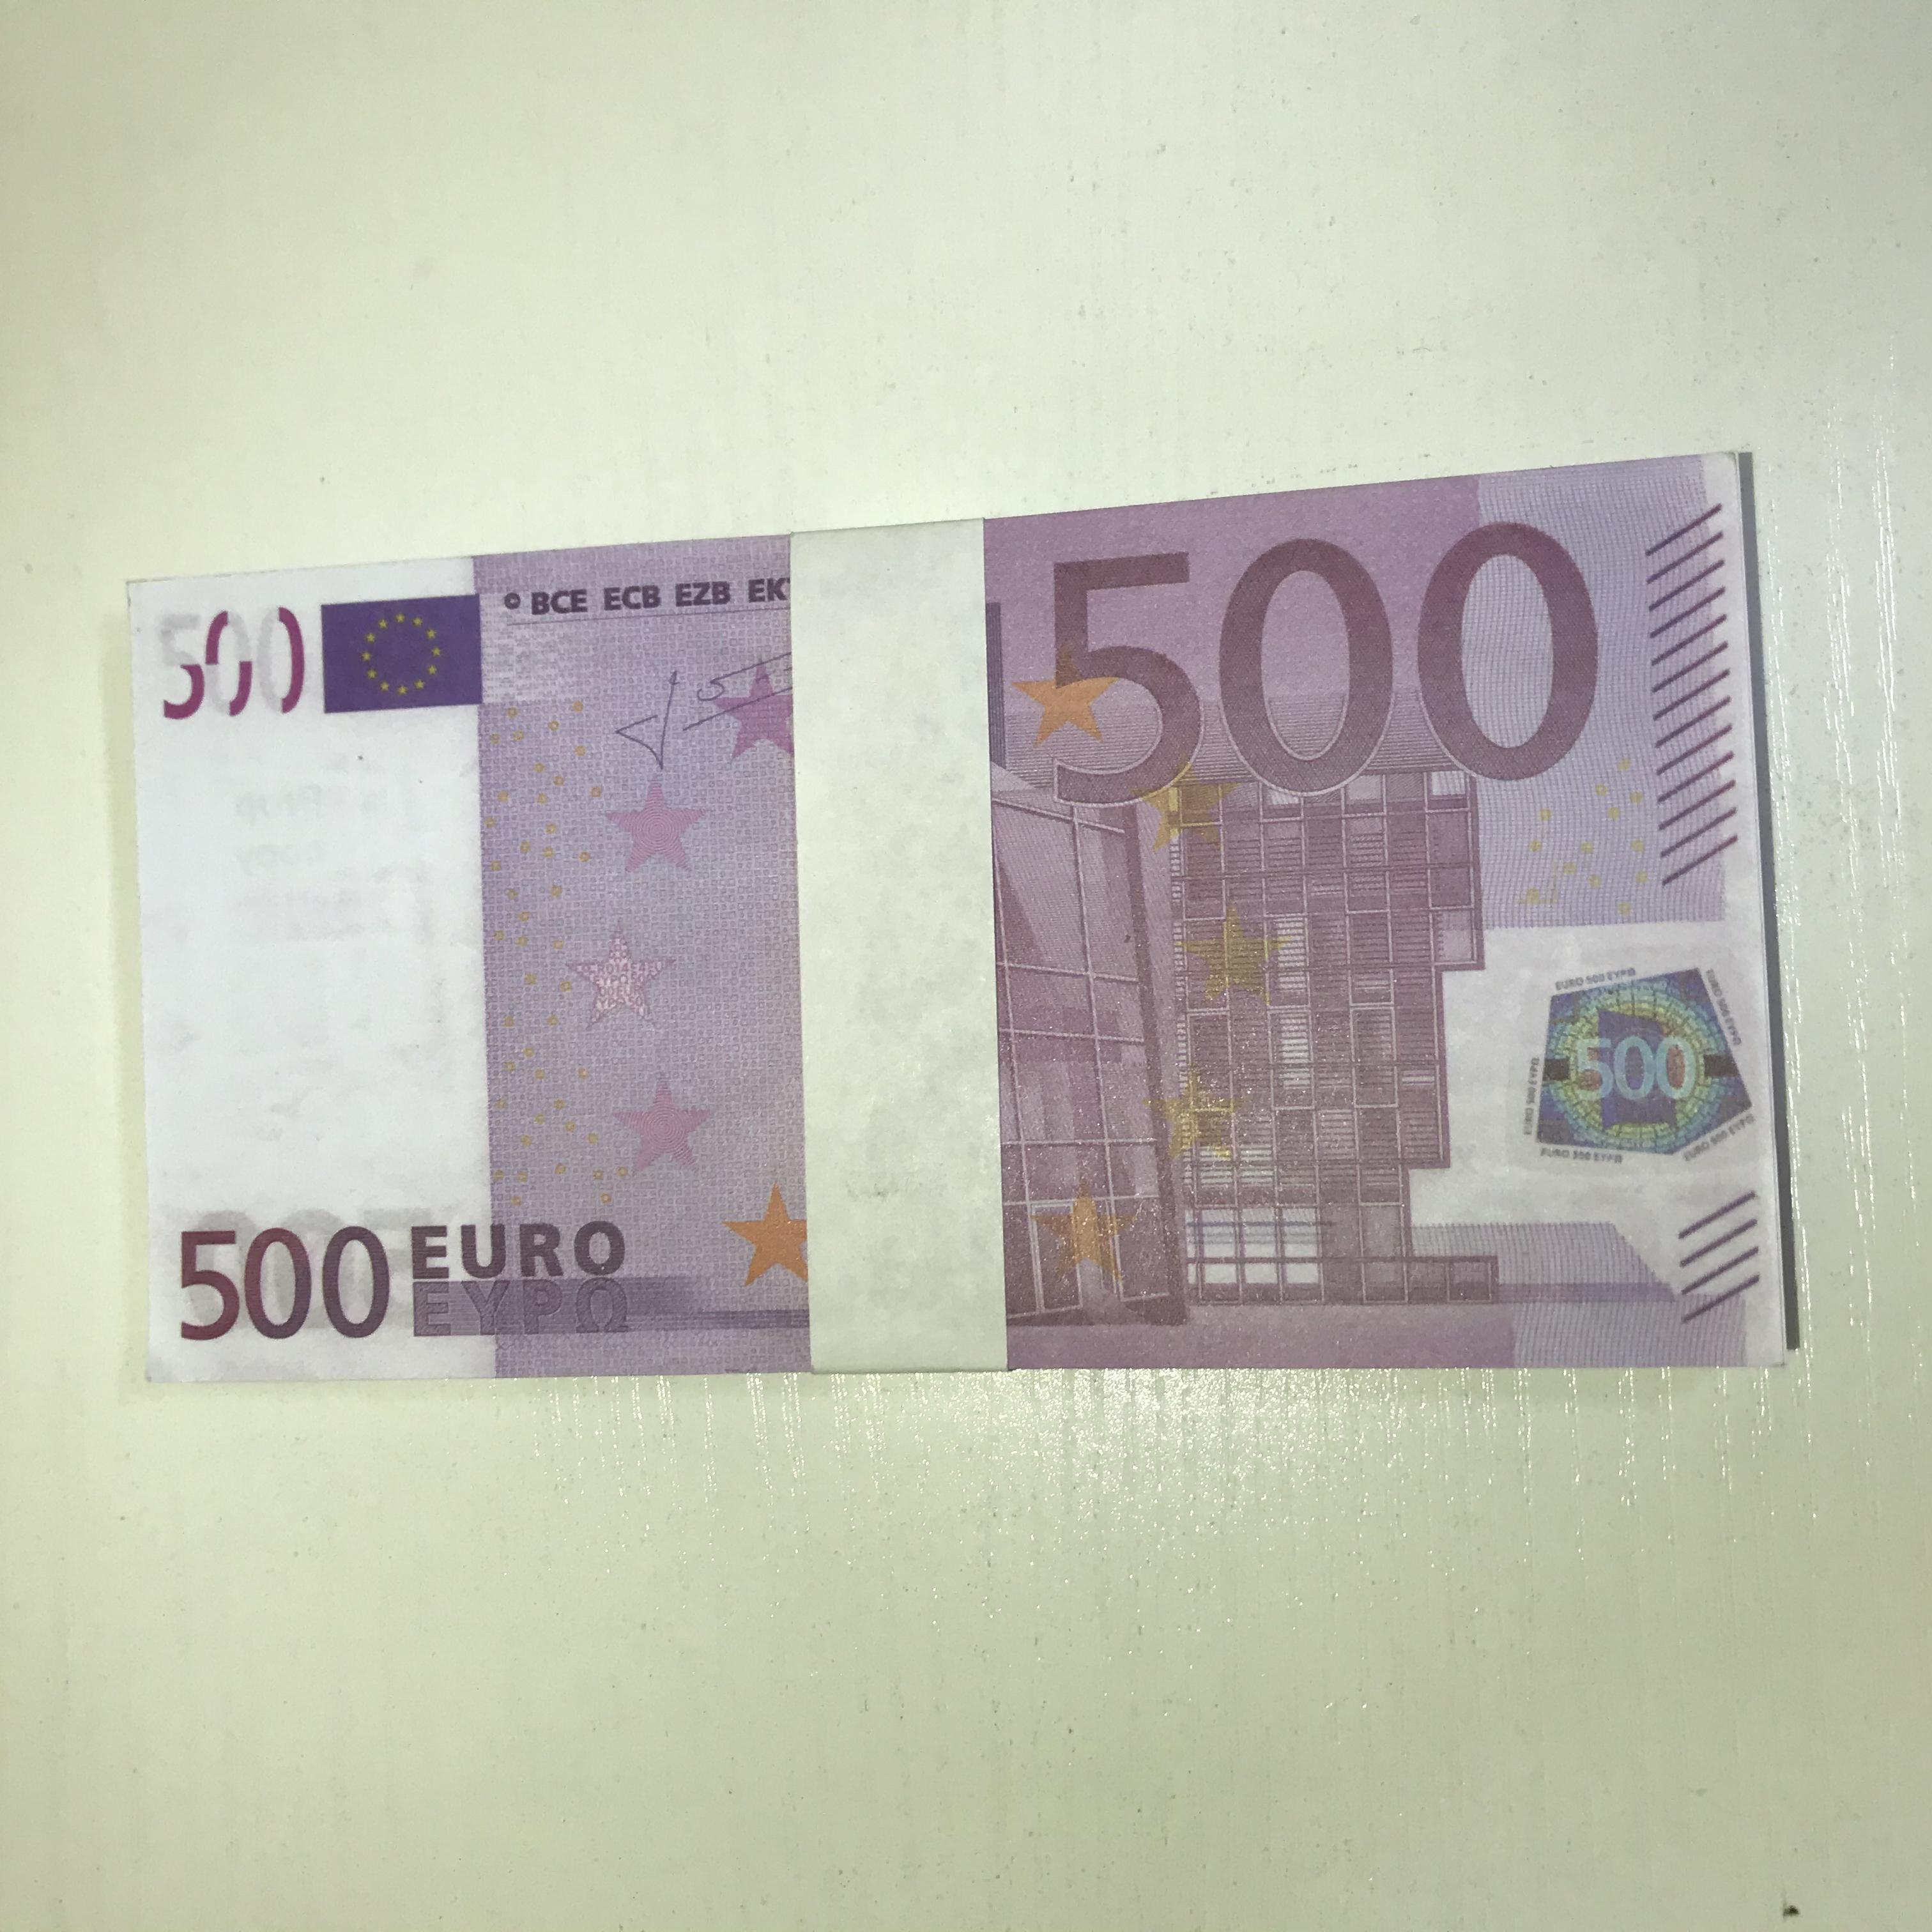 Billet Billet Billet Billet Nouveaux Enfants 500 livres Magie Papier Cadeau Papier Dollar Dollar Dollar Dollar Le500-30 Ftrbo Ticket Euro Uhmgr